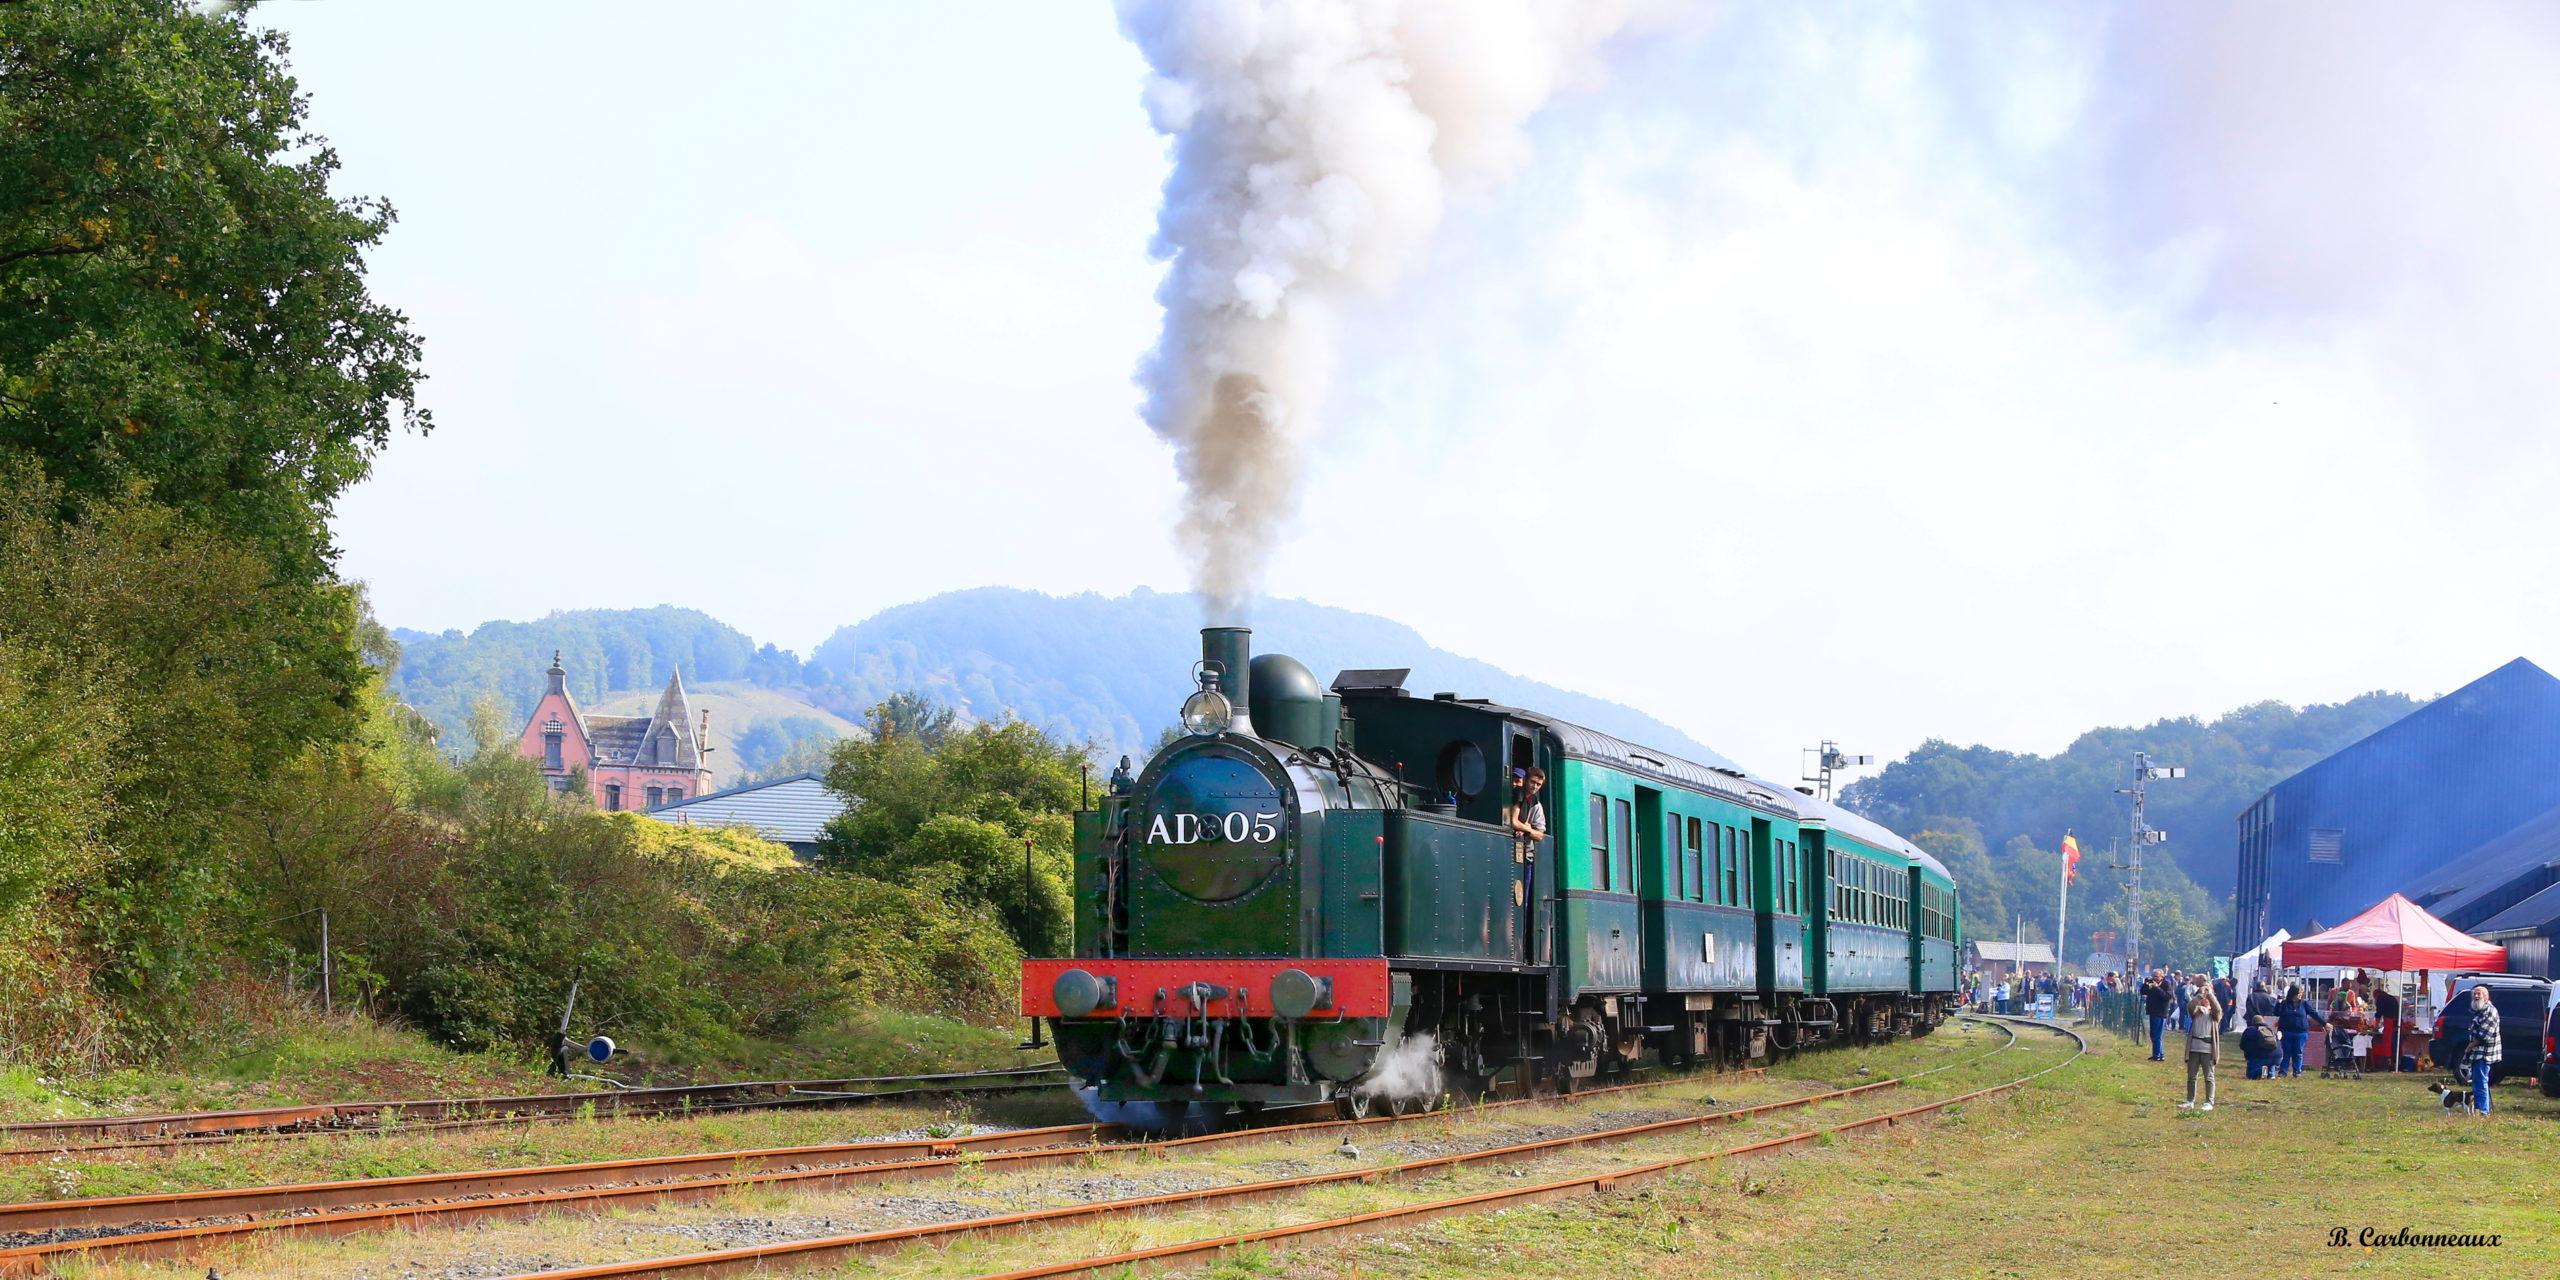 Locomotive AD 05